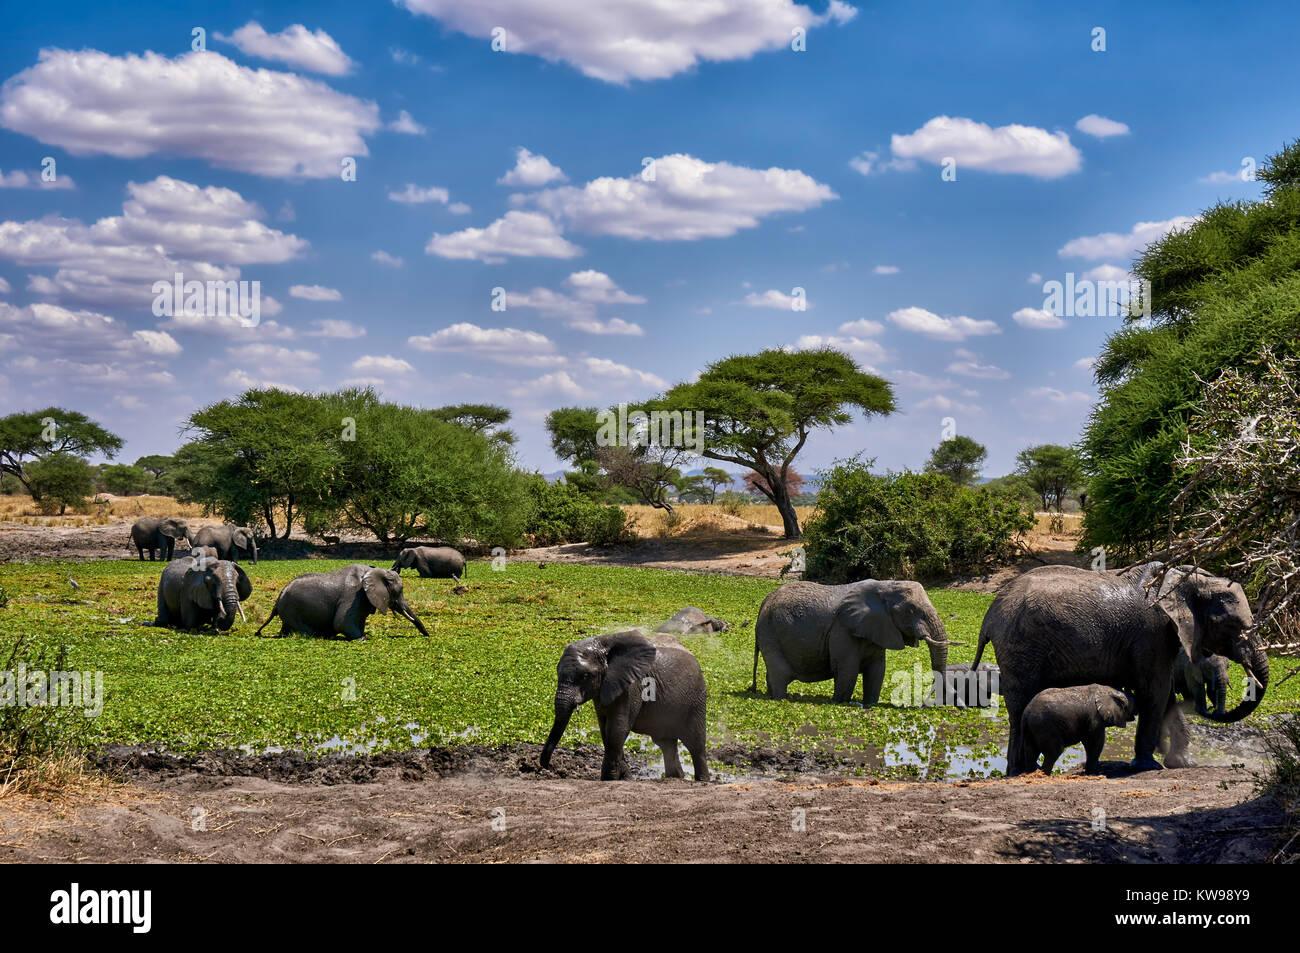 African bush elephants at waterhole, Loxodonta africana, in Tarangire National Park, Tanzania, Africa - Stock Image